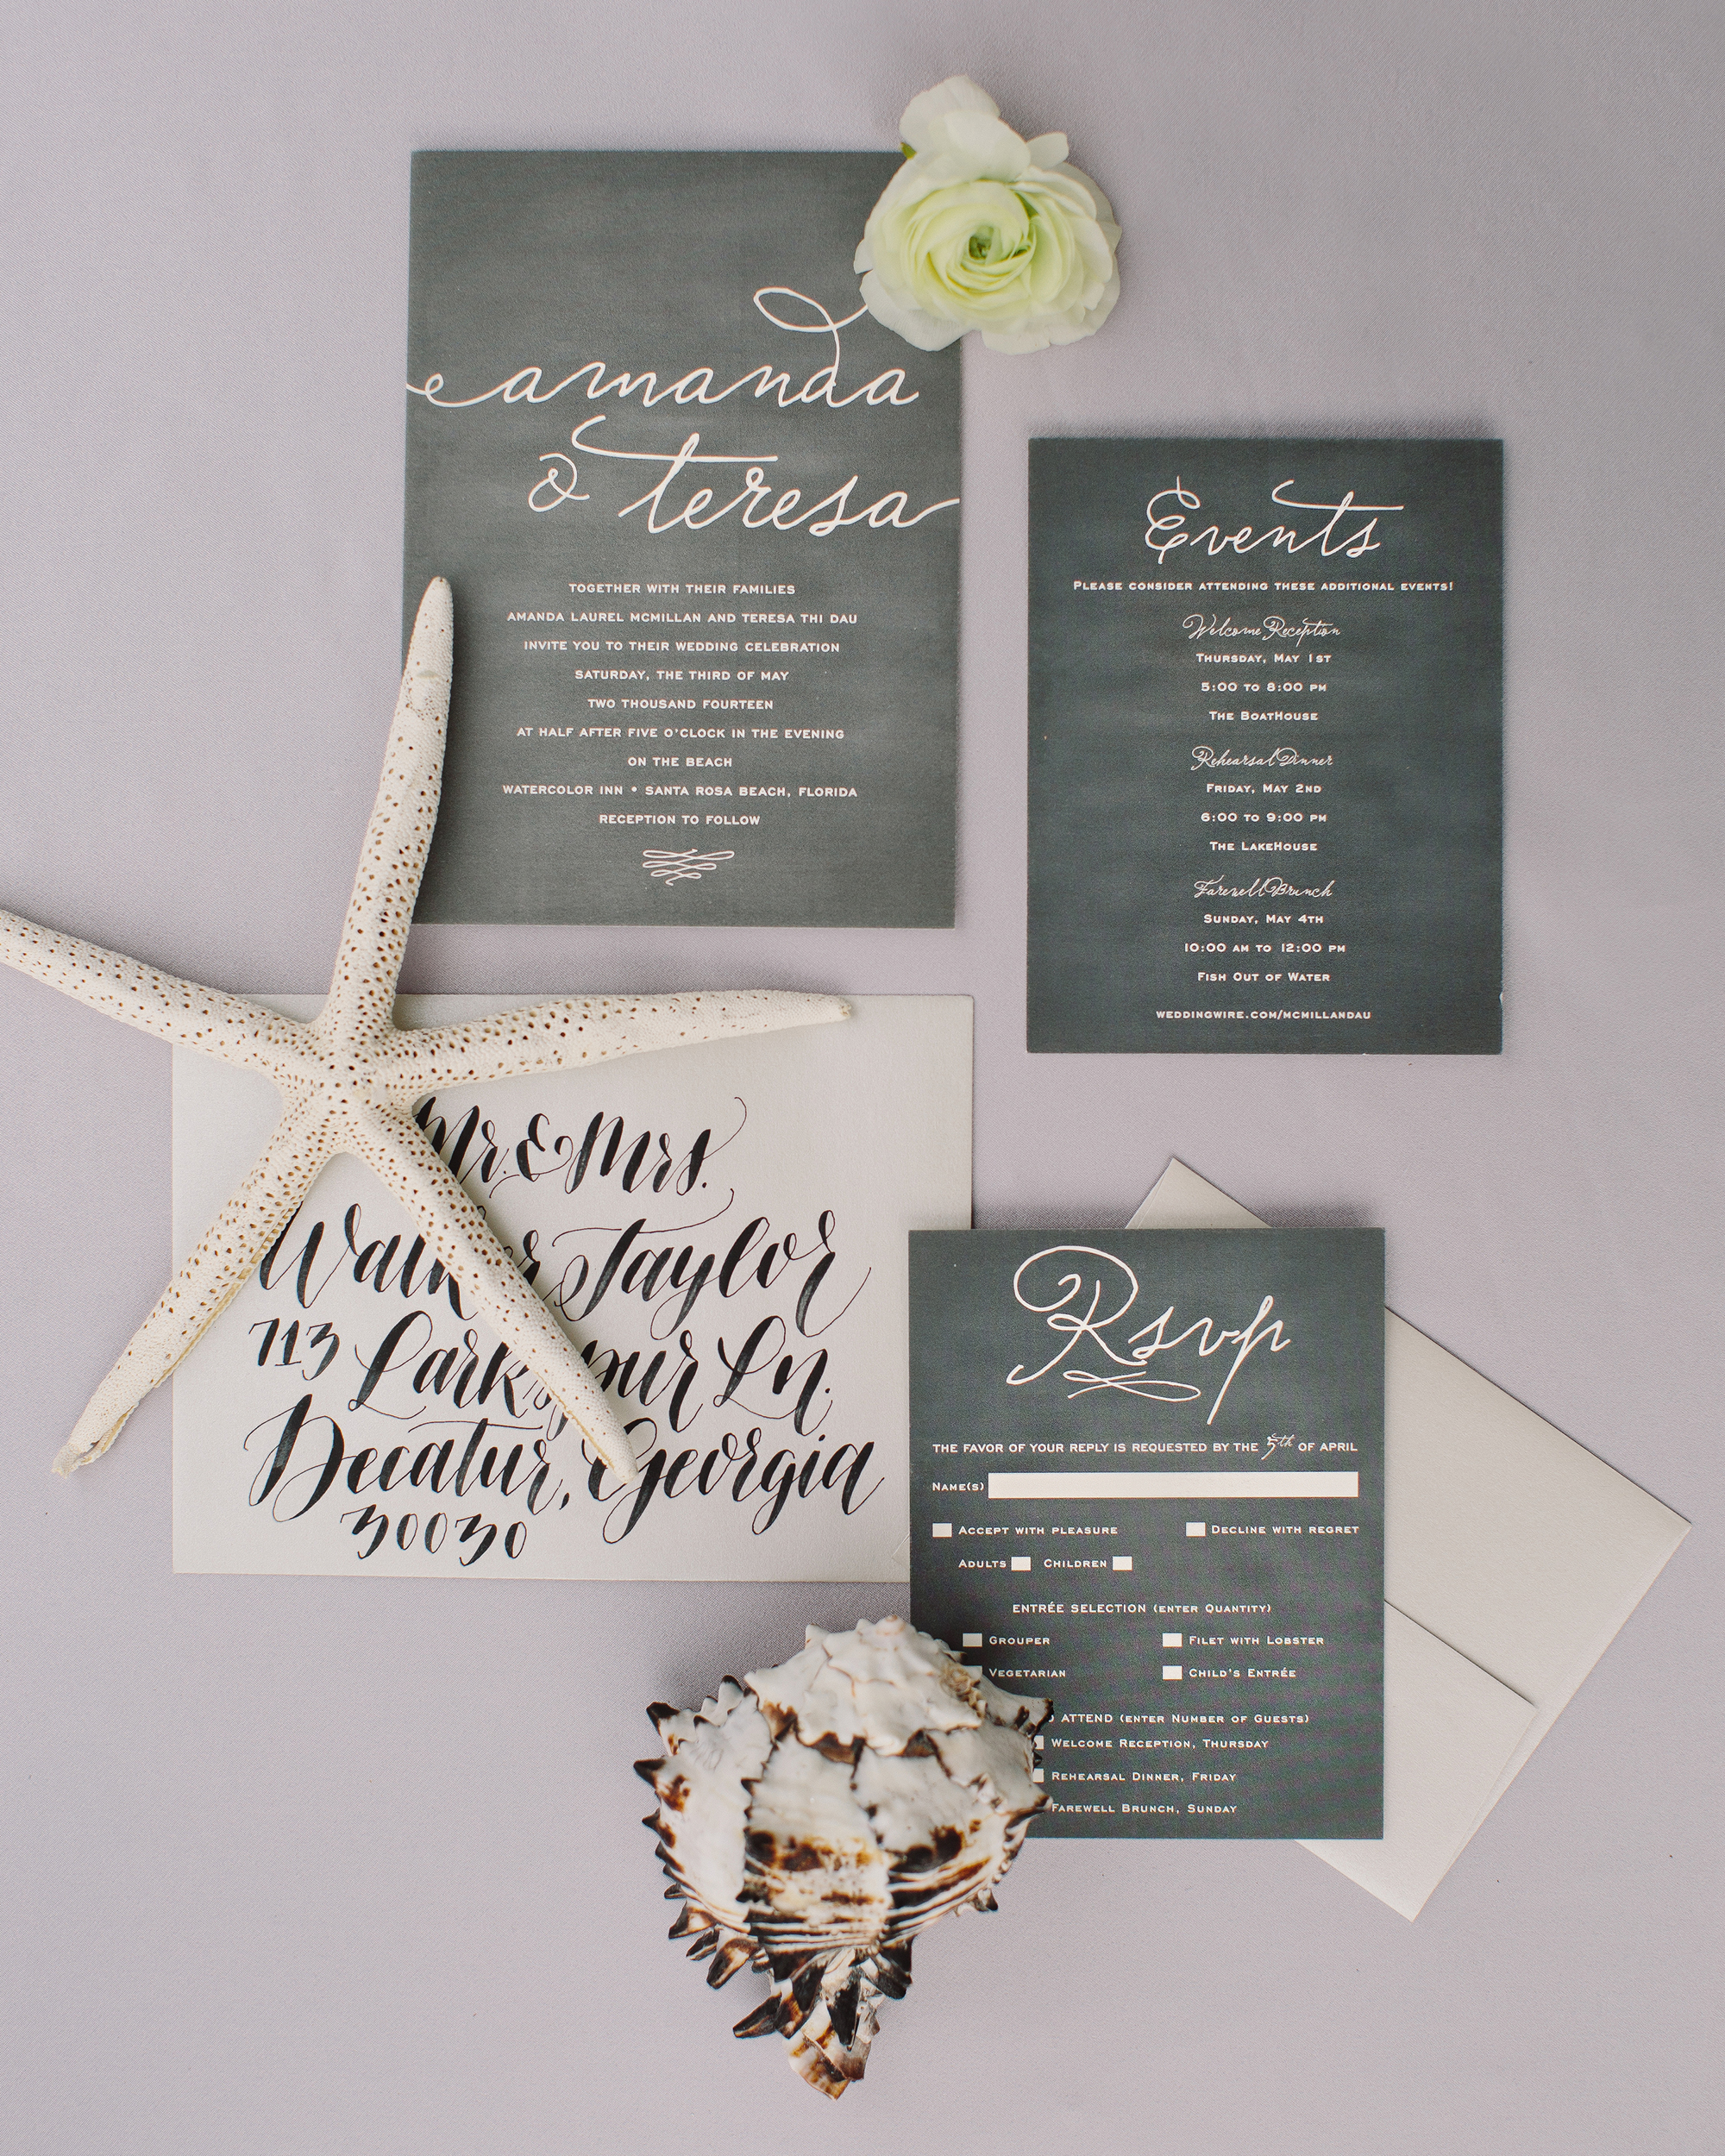 teresa-amanda-wedding-invite-7676-s111694-1114.jpg